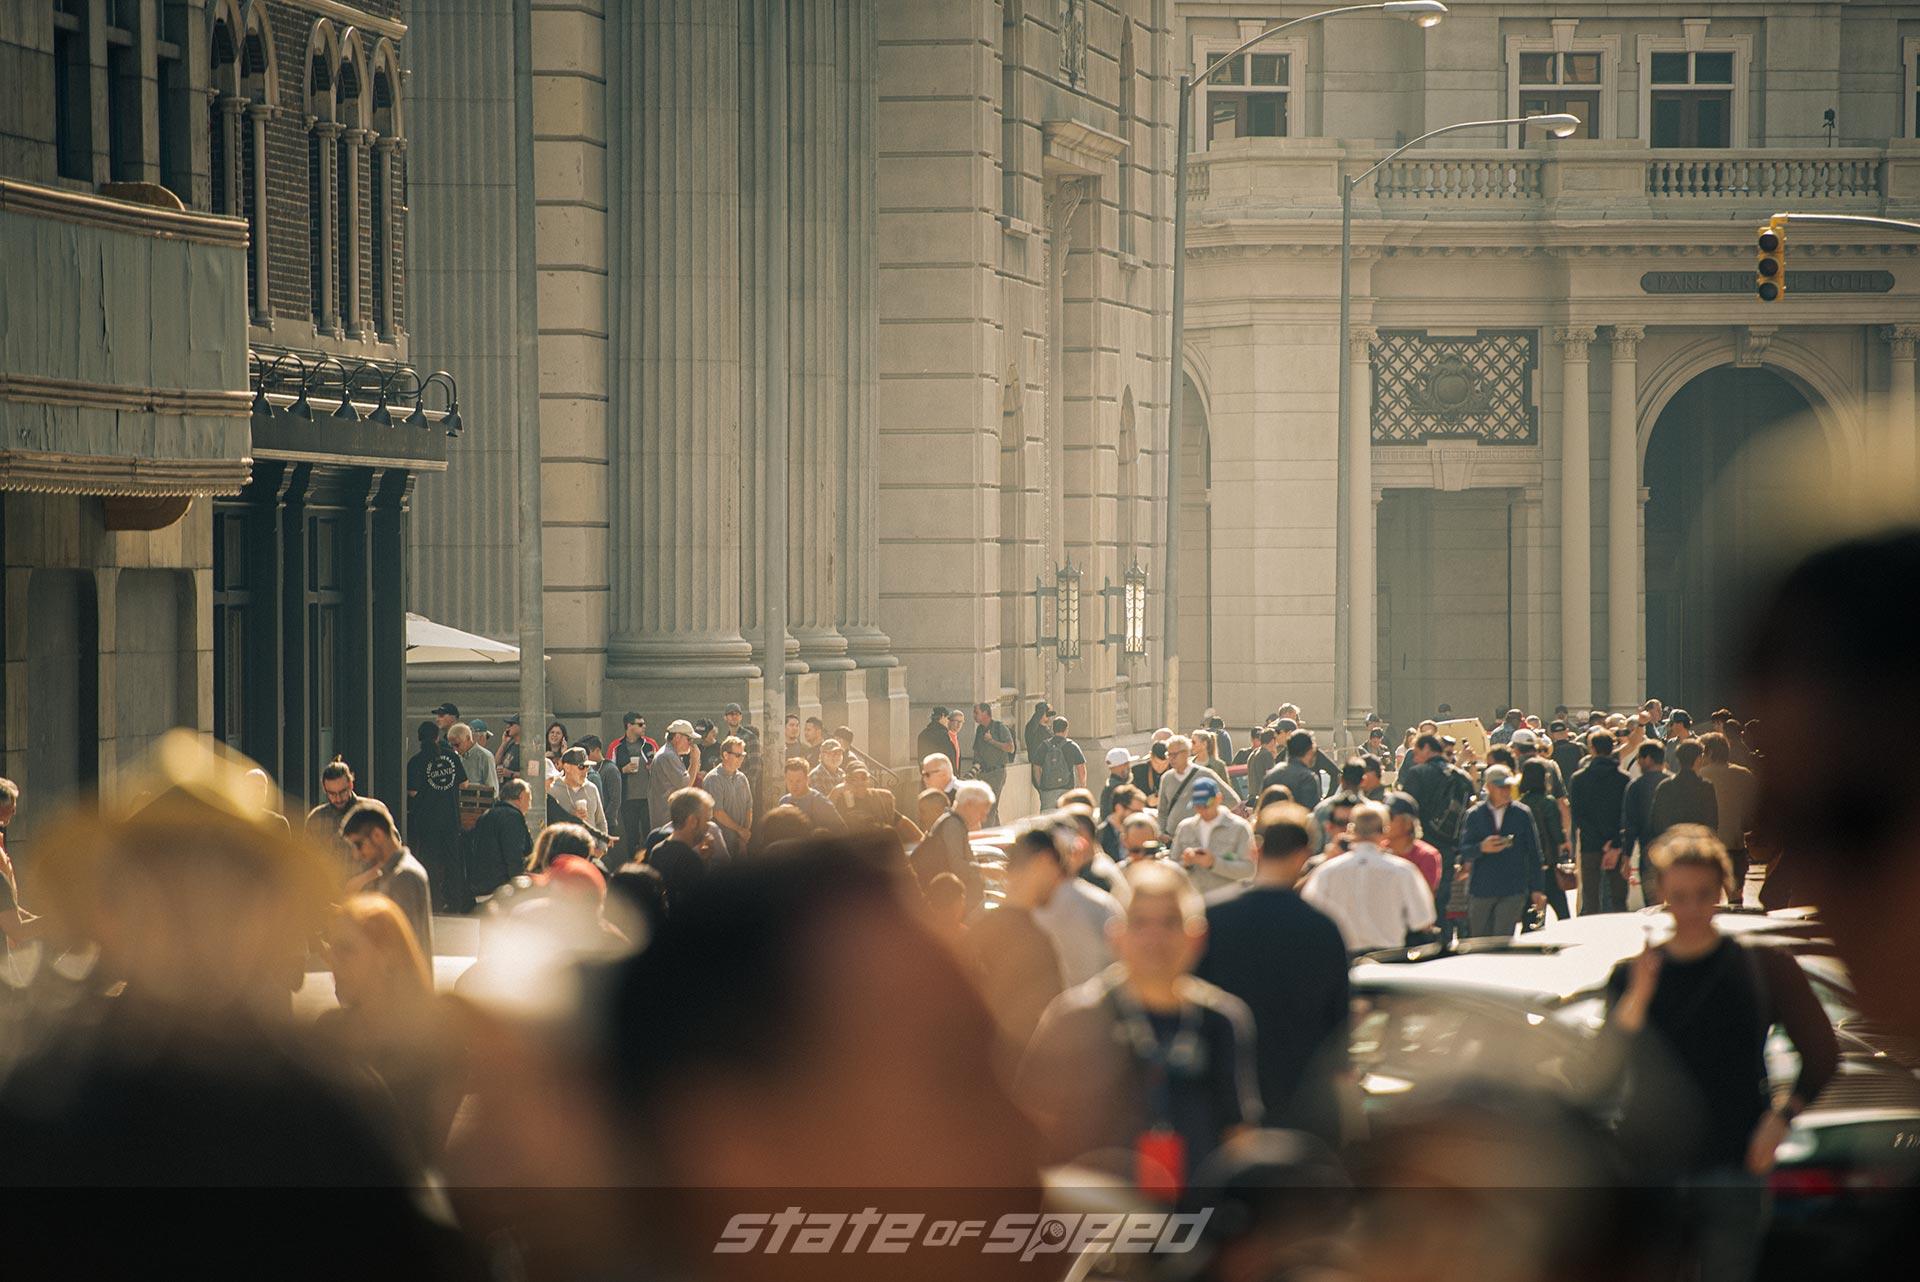 Crowds in Universal Studios